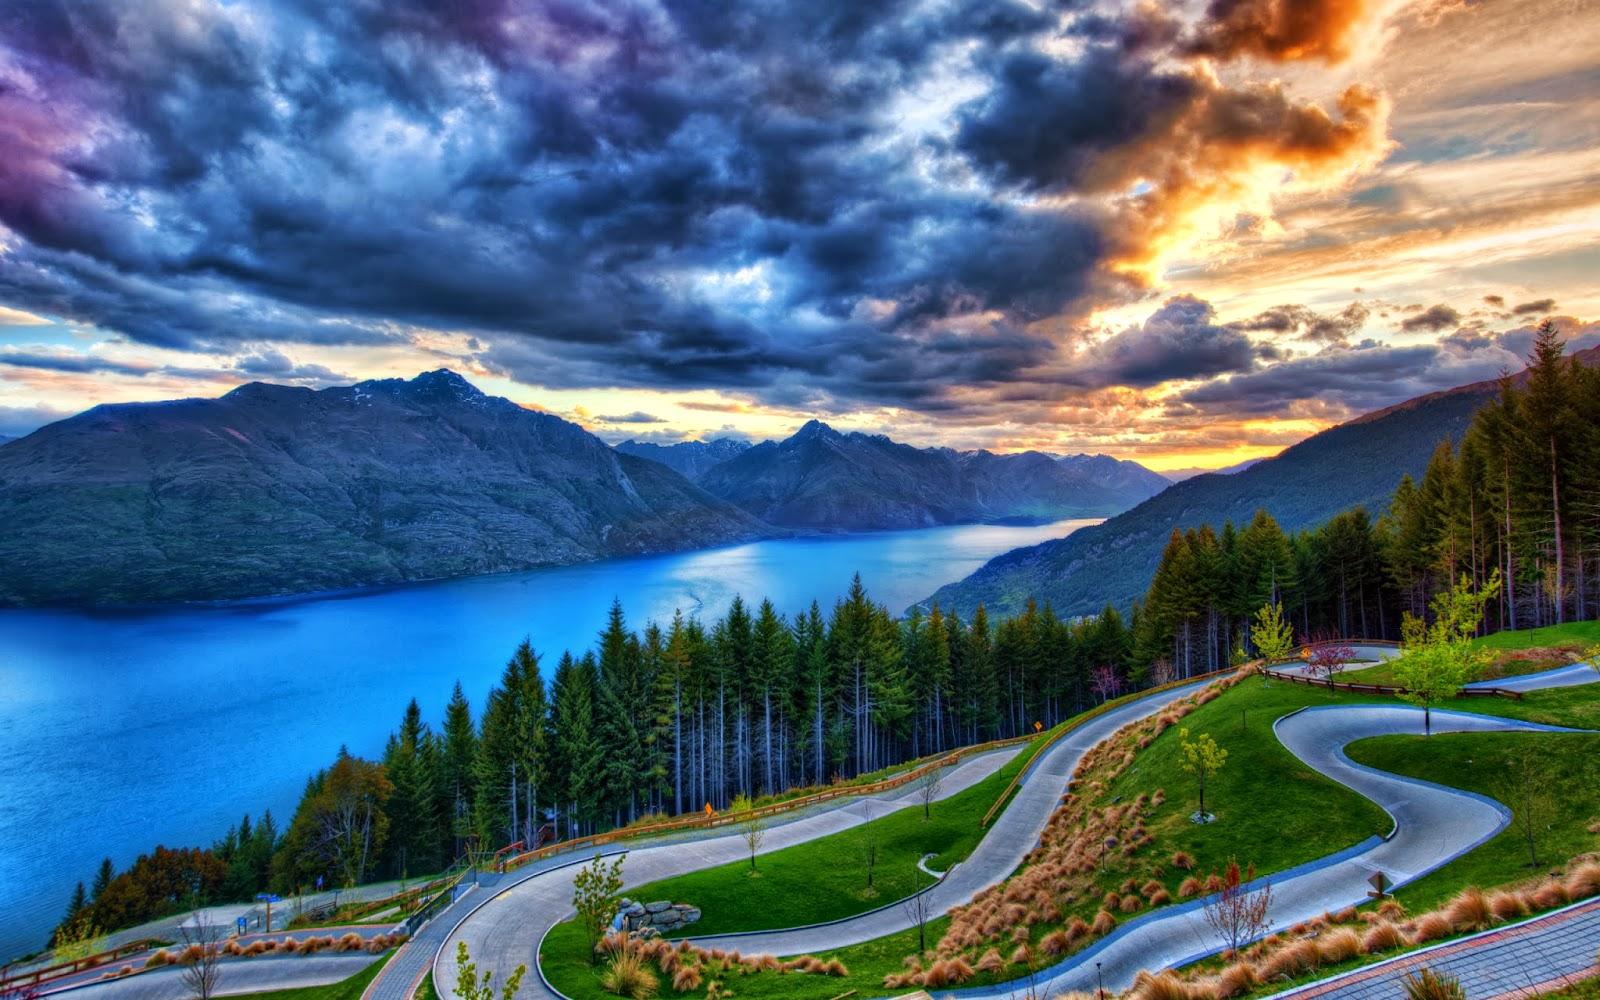 New Zealand Beautiful Nature , HD Wallpaper & Backgrounds